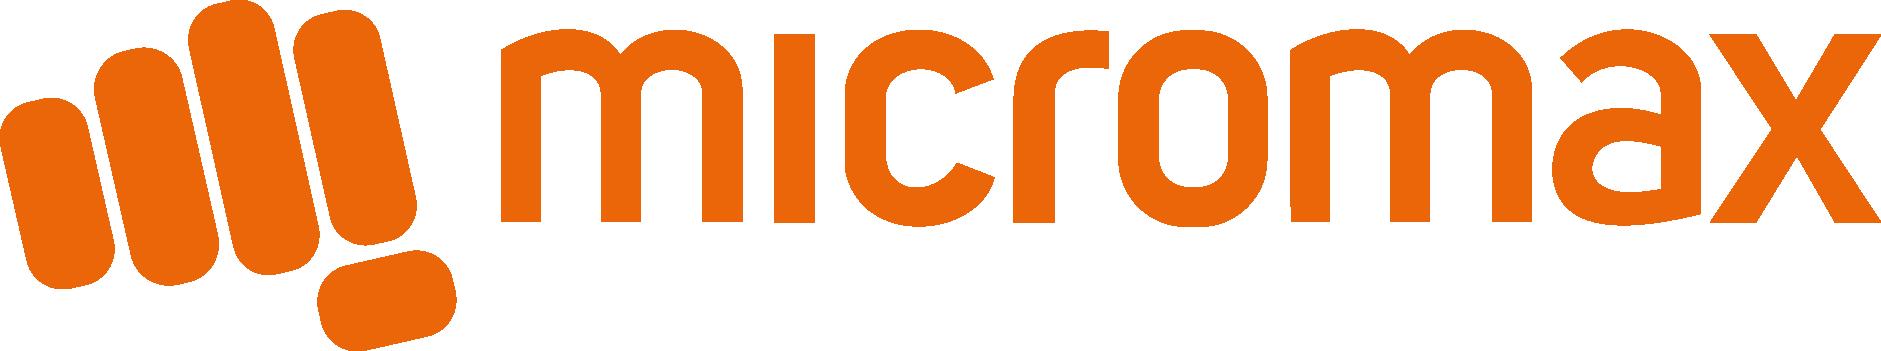 Micromax Logo png